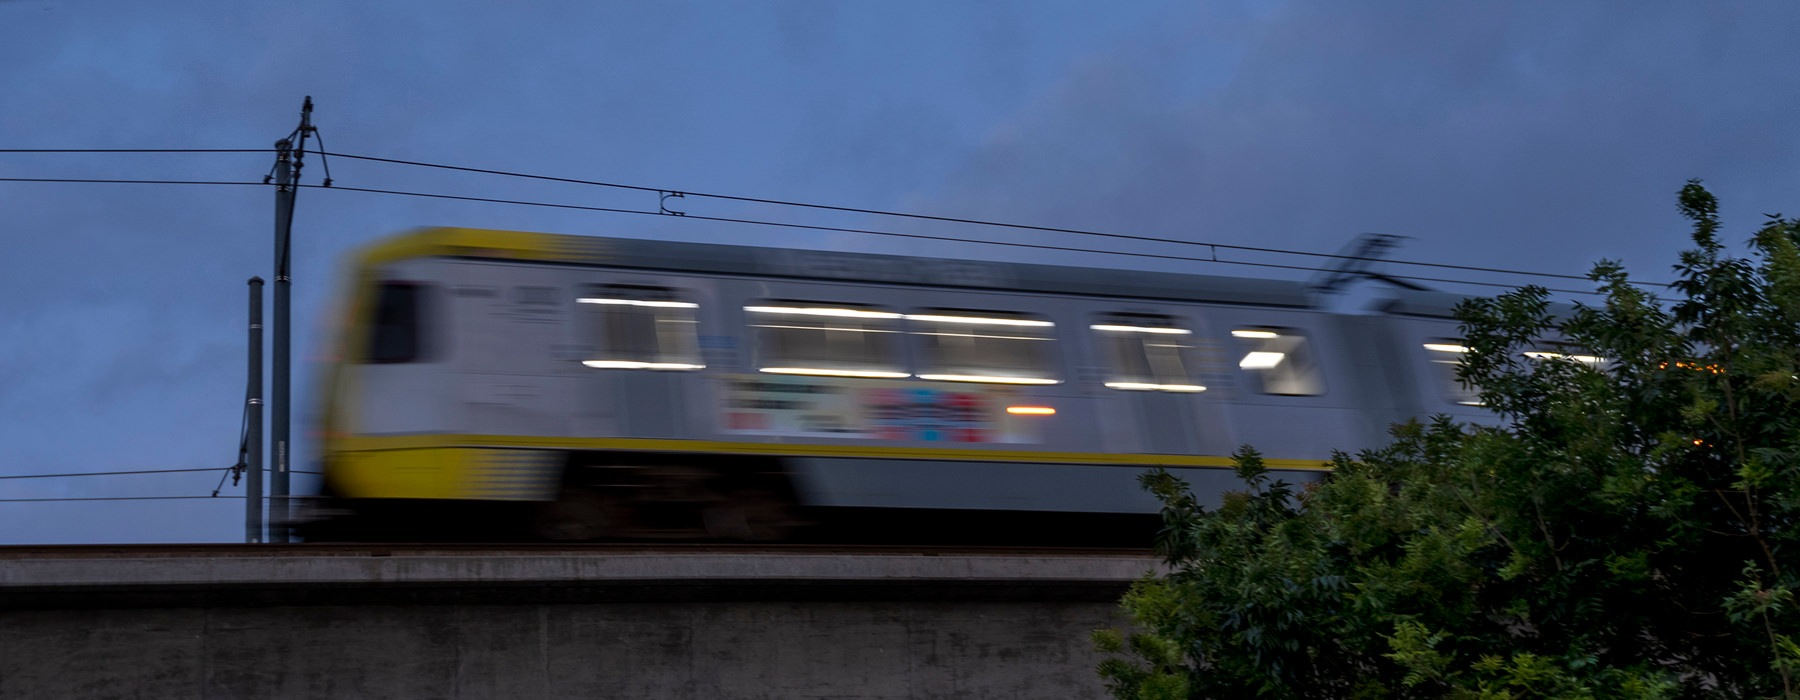 train passing on overhead tracks